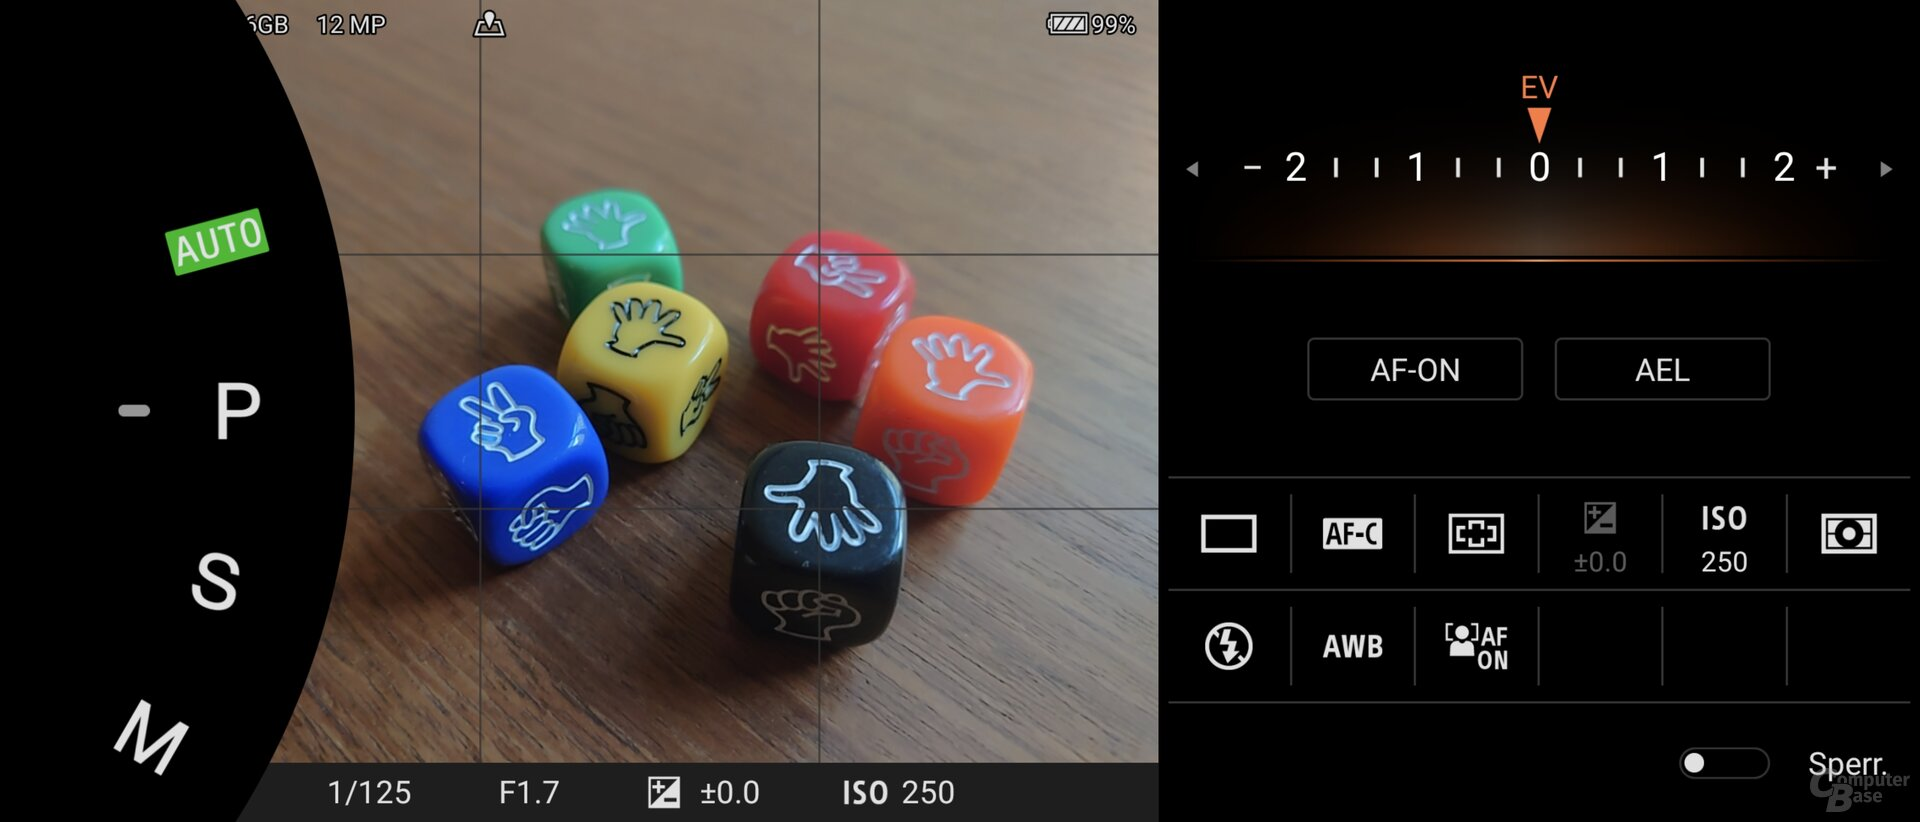 Photo-Pro-App im P-Modus